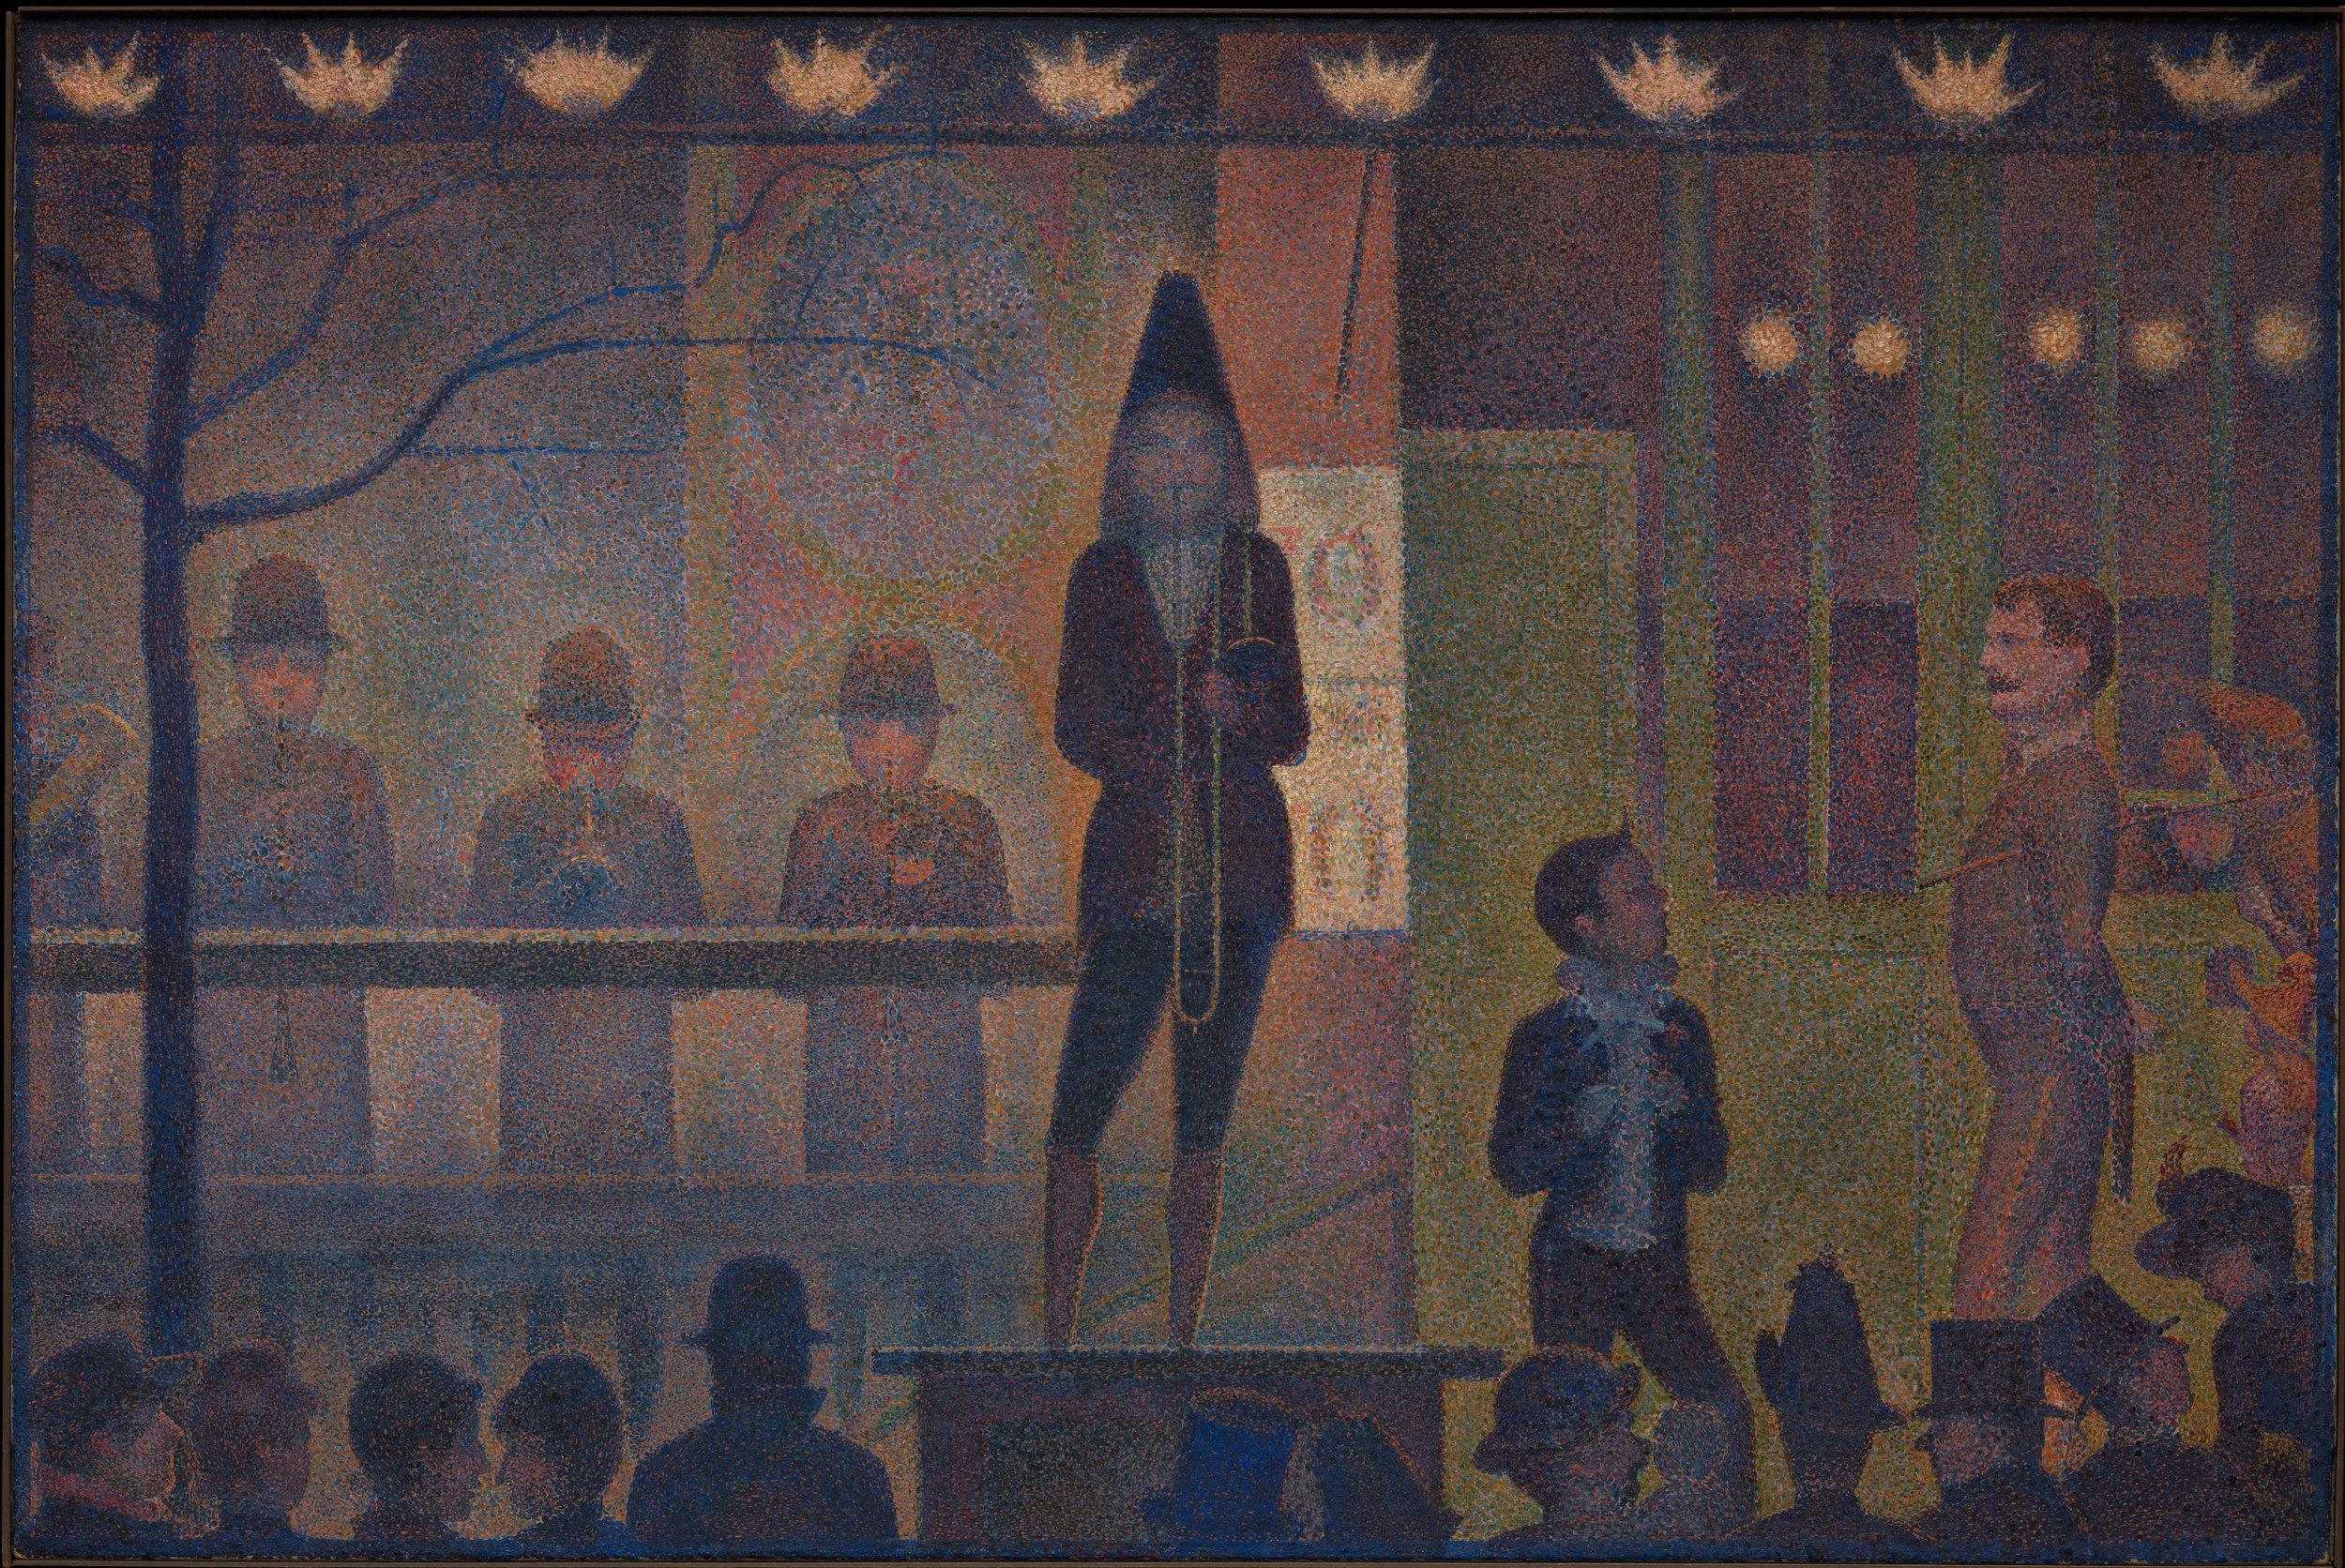 """Parade de cirque"" by Georges Seurat"